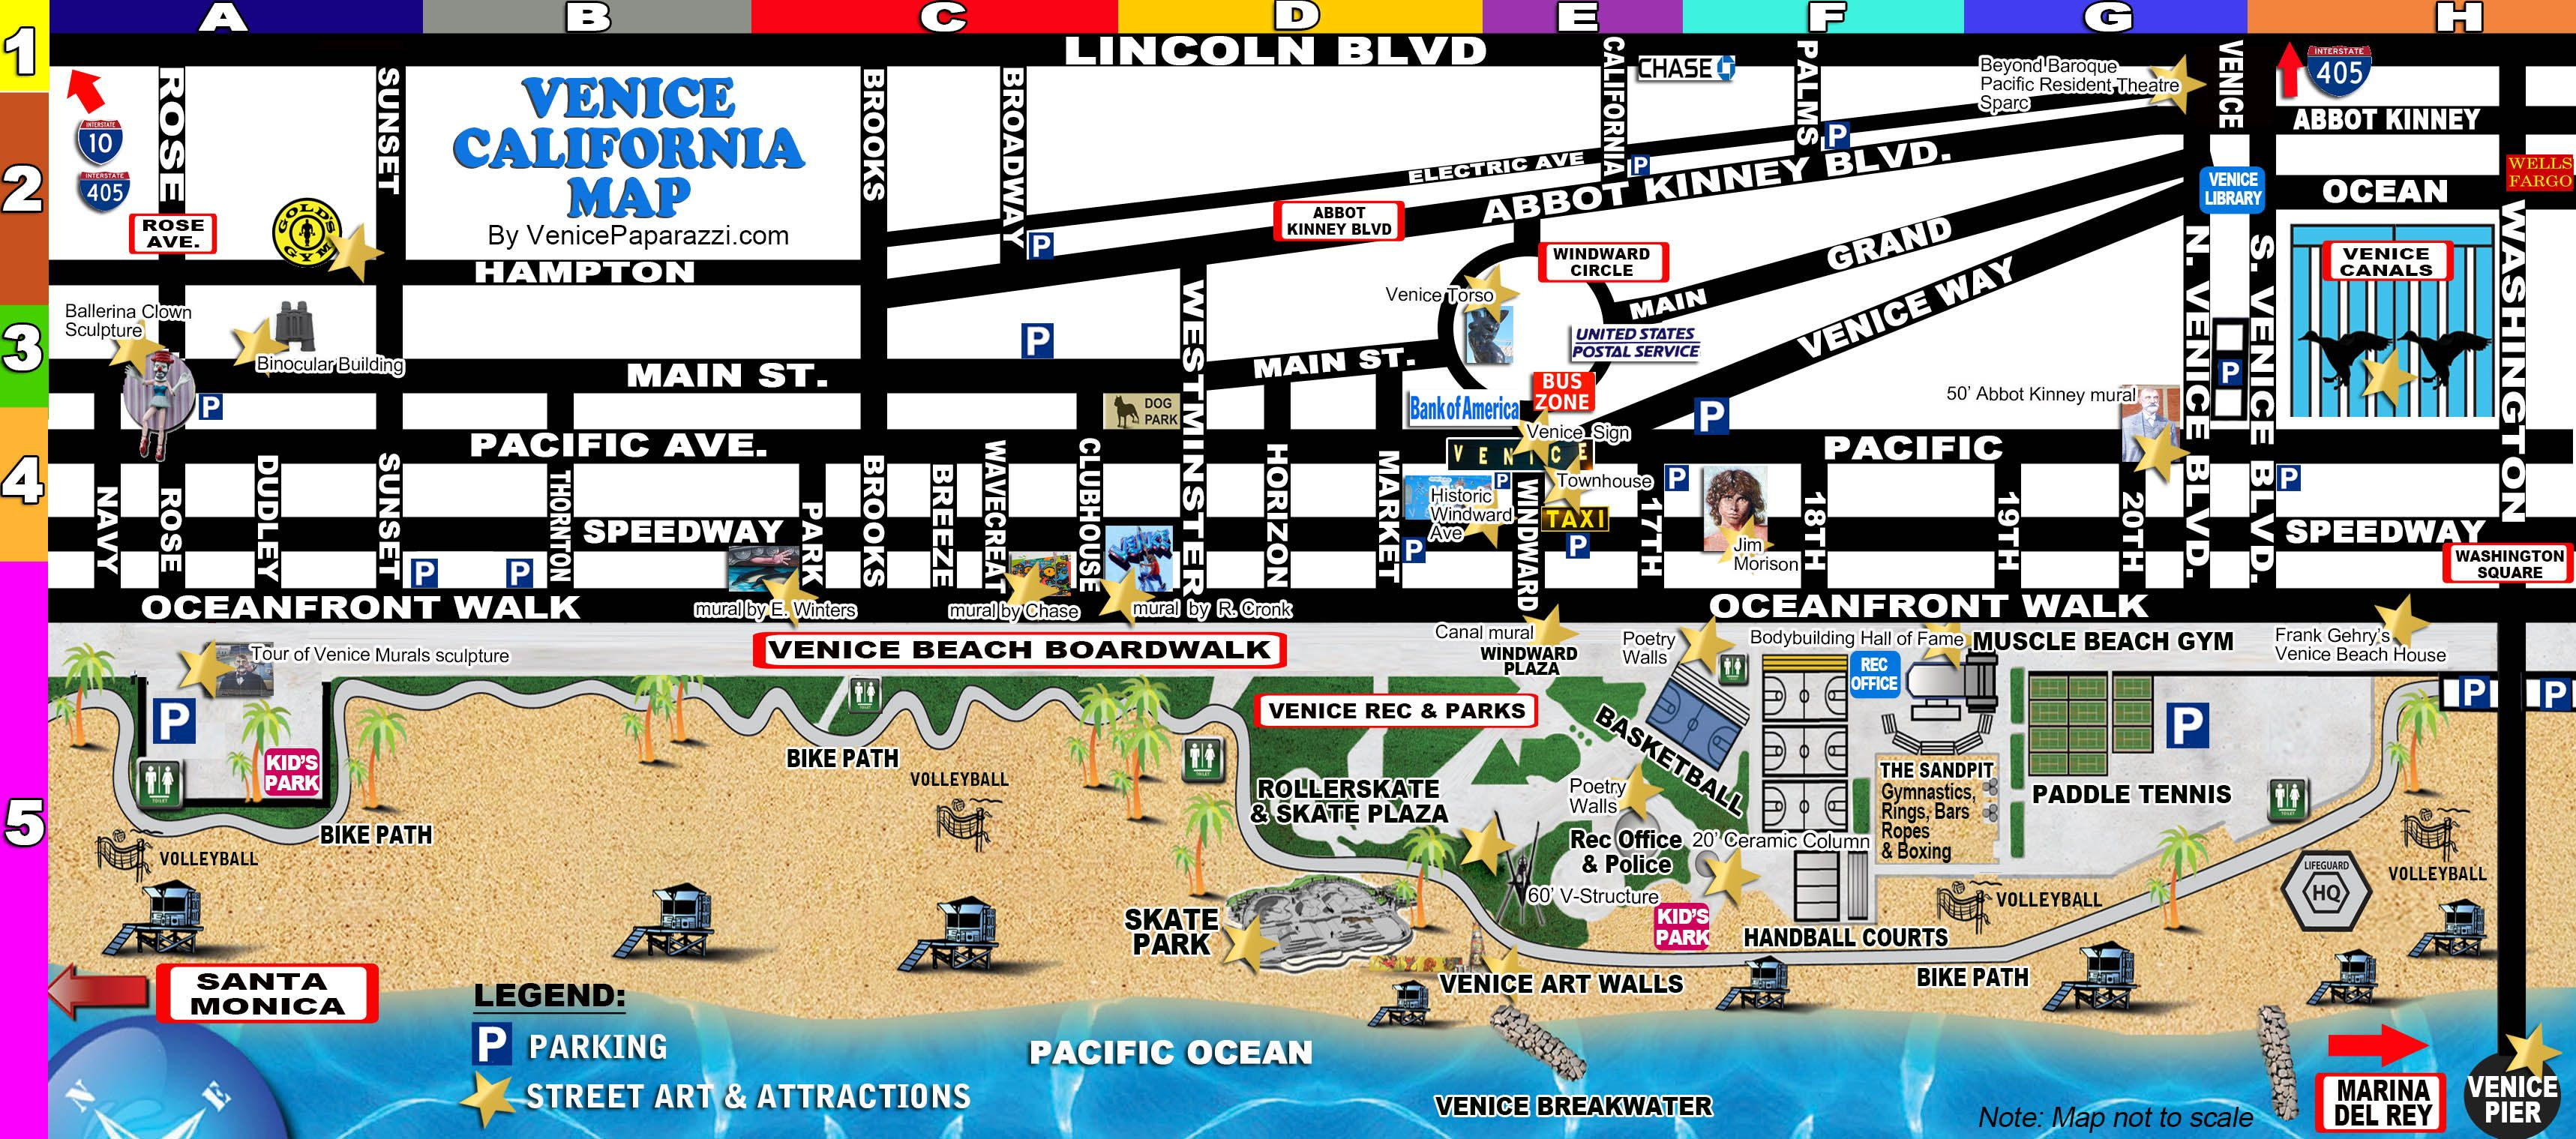 Venicebeachfun Checklist Map California Venice Beach California Map - Venice Beach California Map